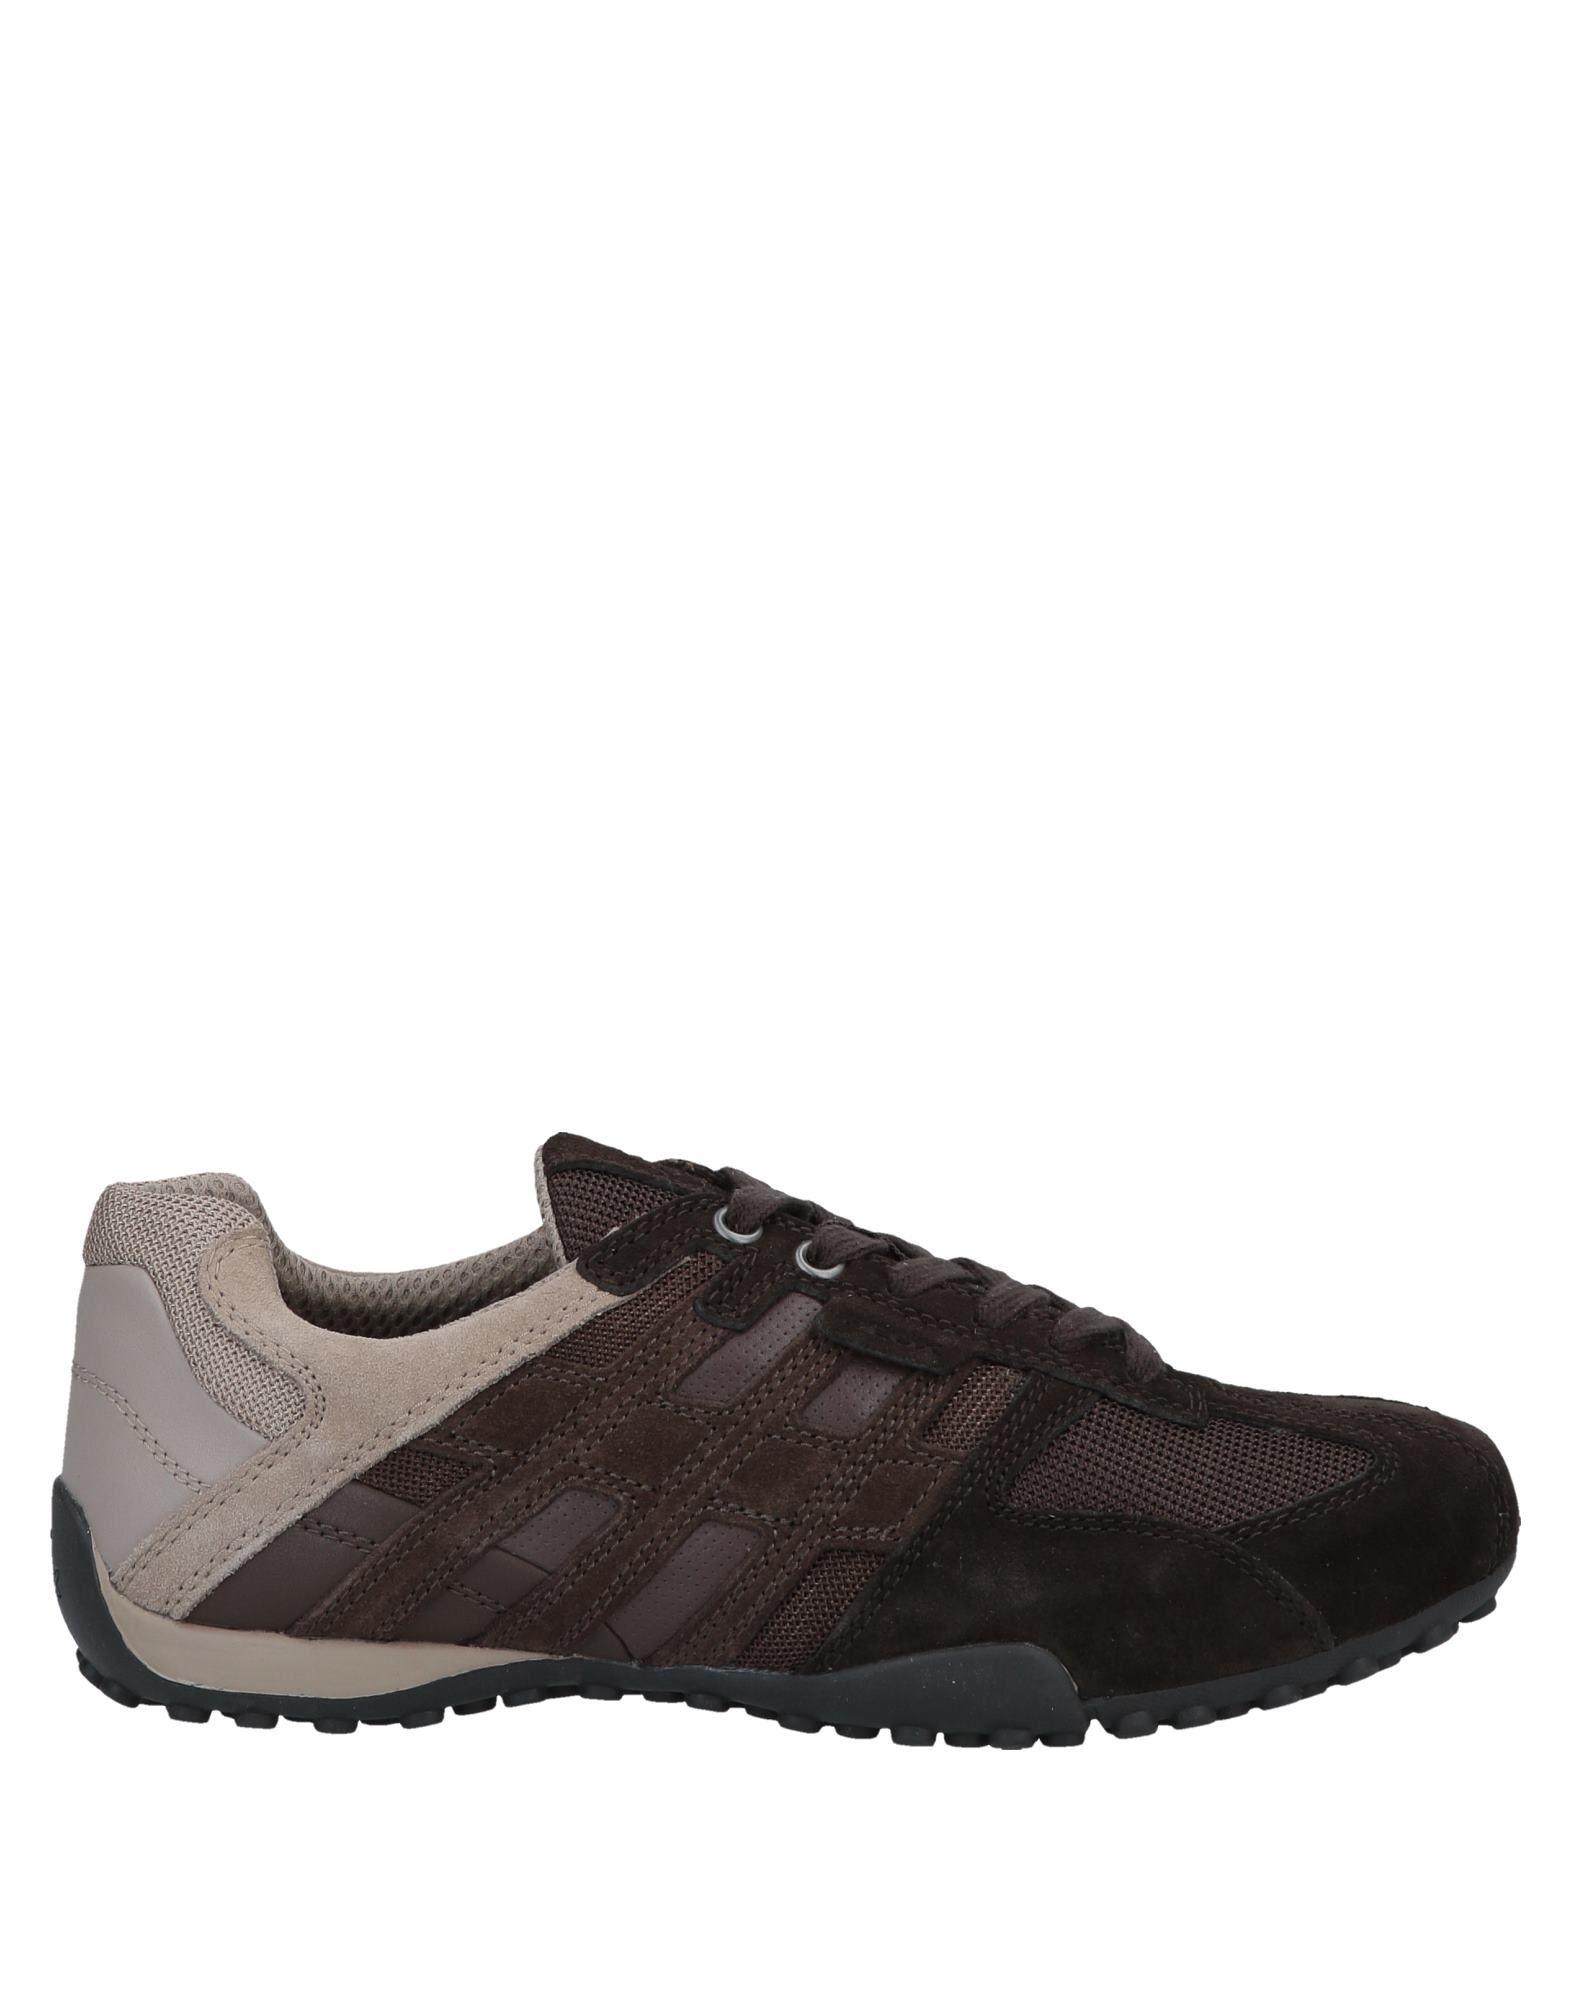 shopping popular brand brand new Geox Sneakers - Men Geox Sneakers online on YOOX Australia ...